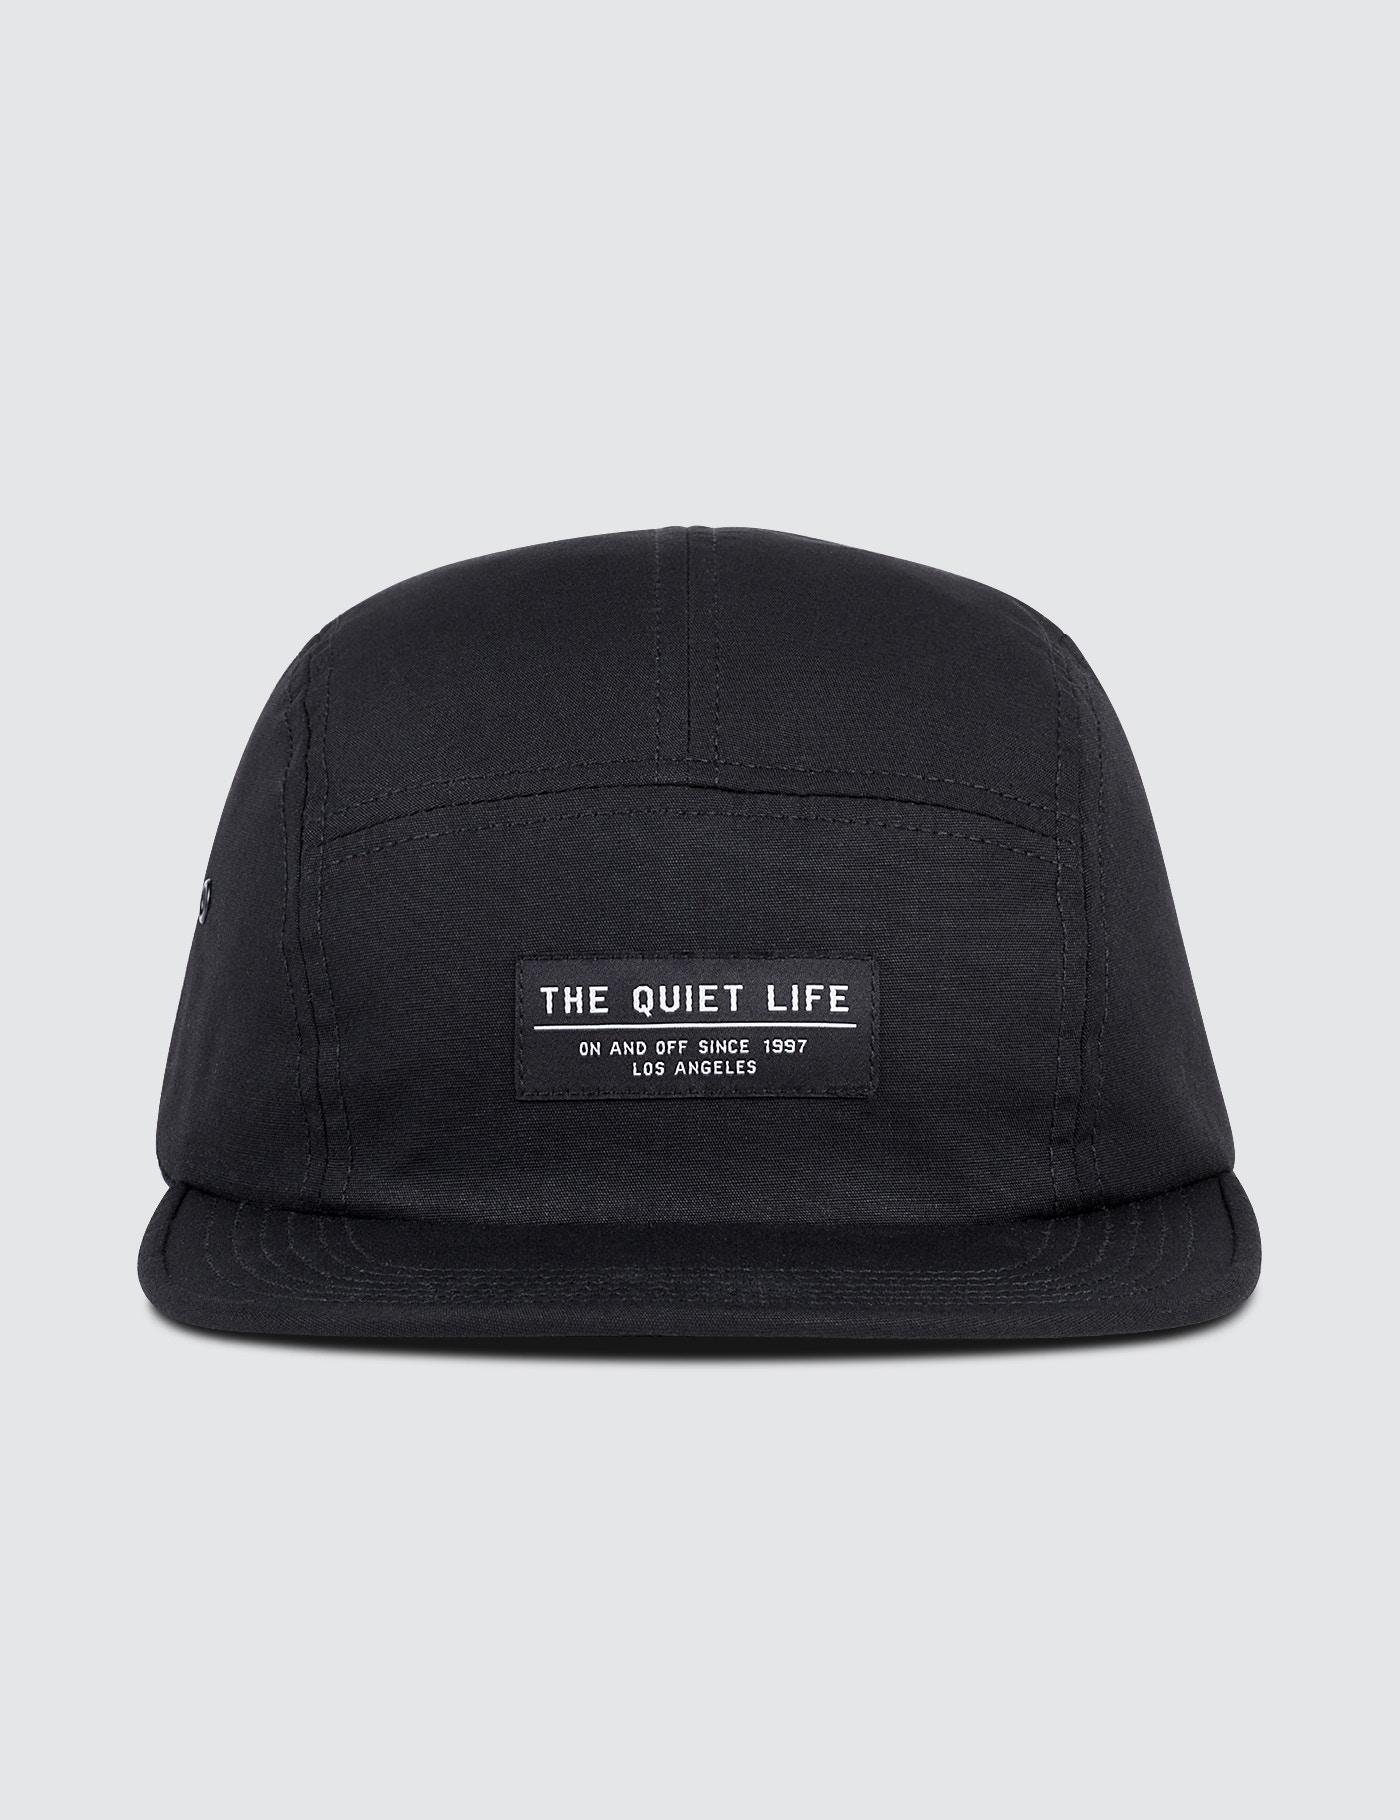 cfcf7de2364 Lyst - The Quiet Life Foundation 5 Panel Camp Cap in Black for Men